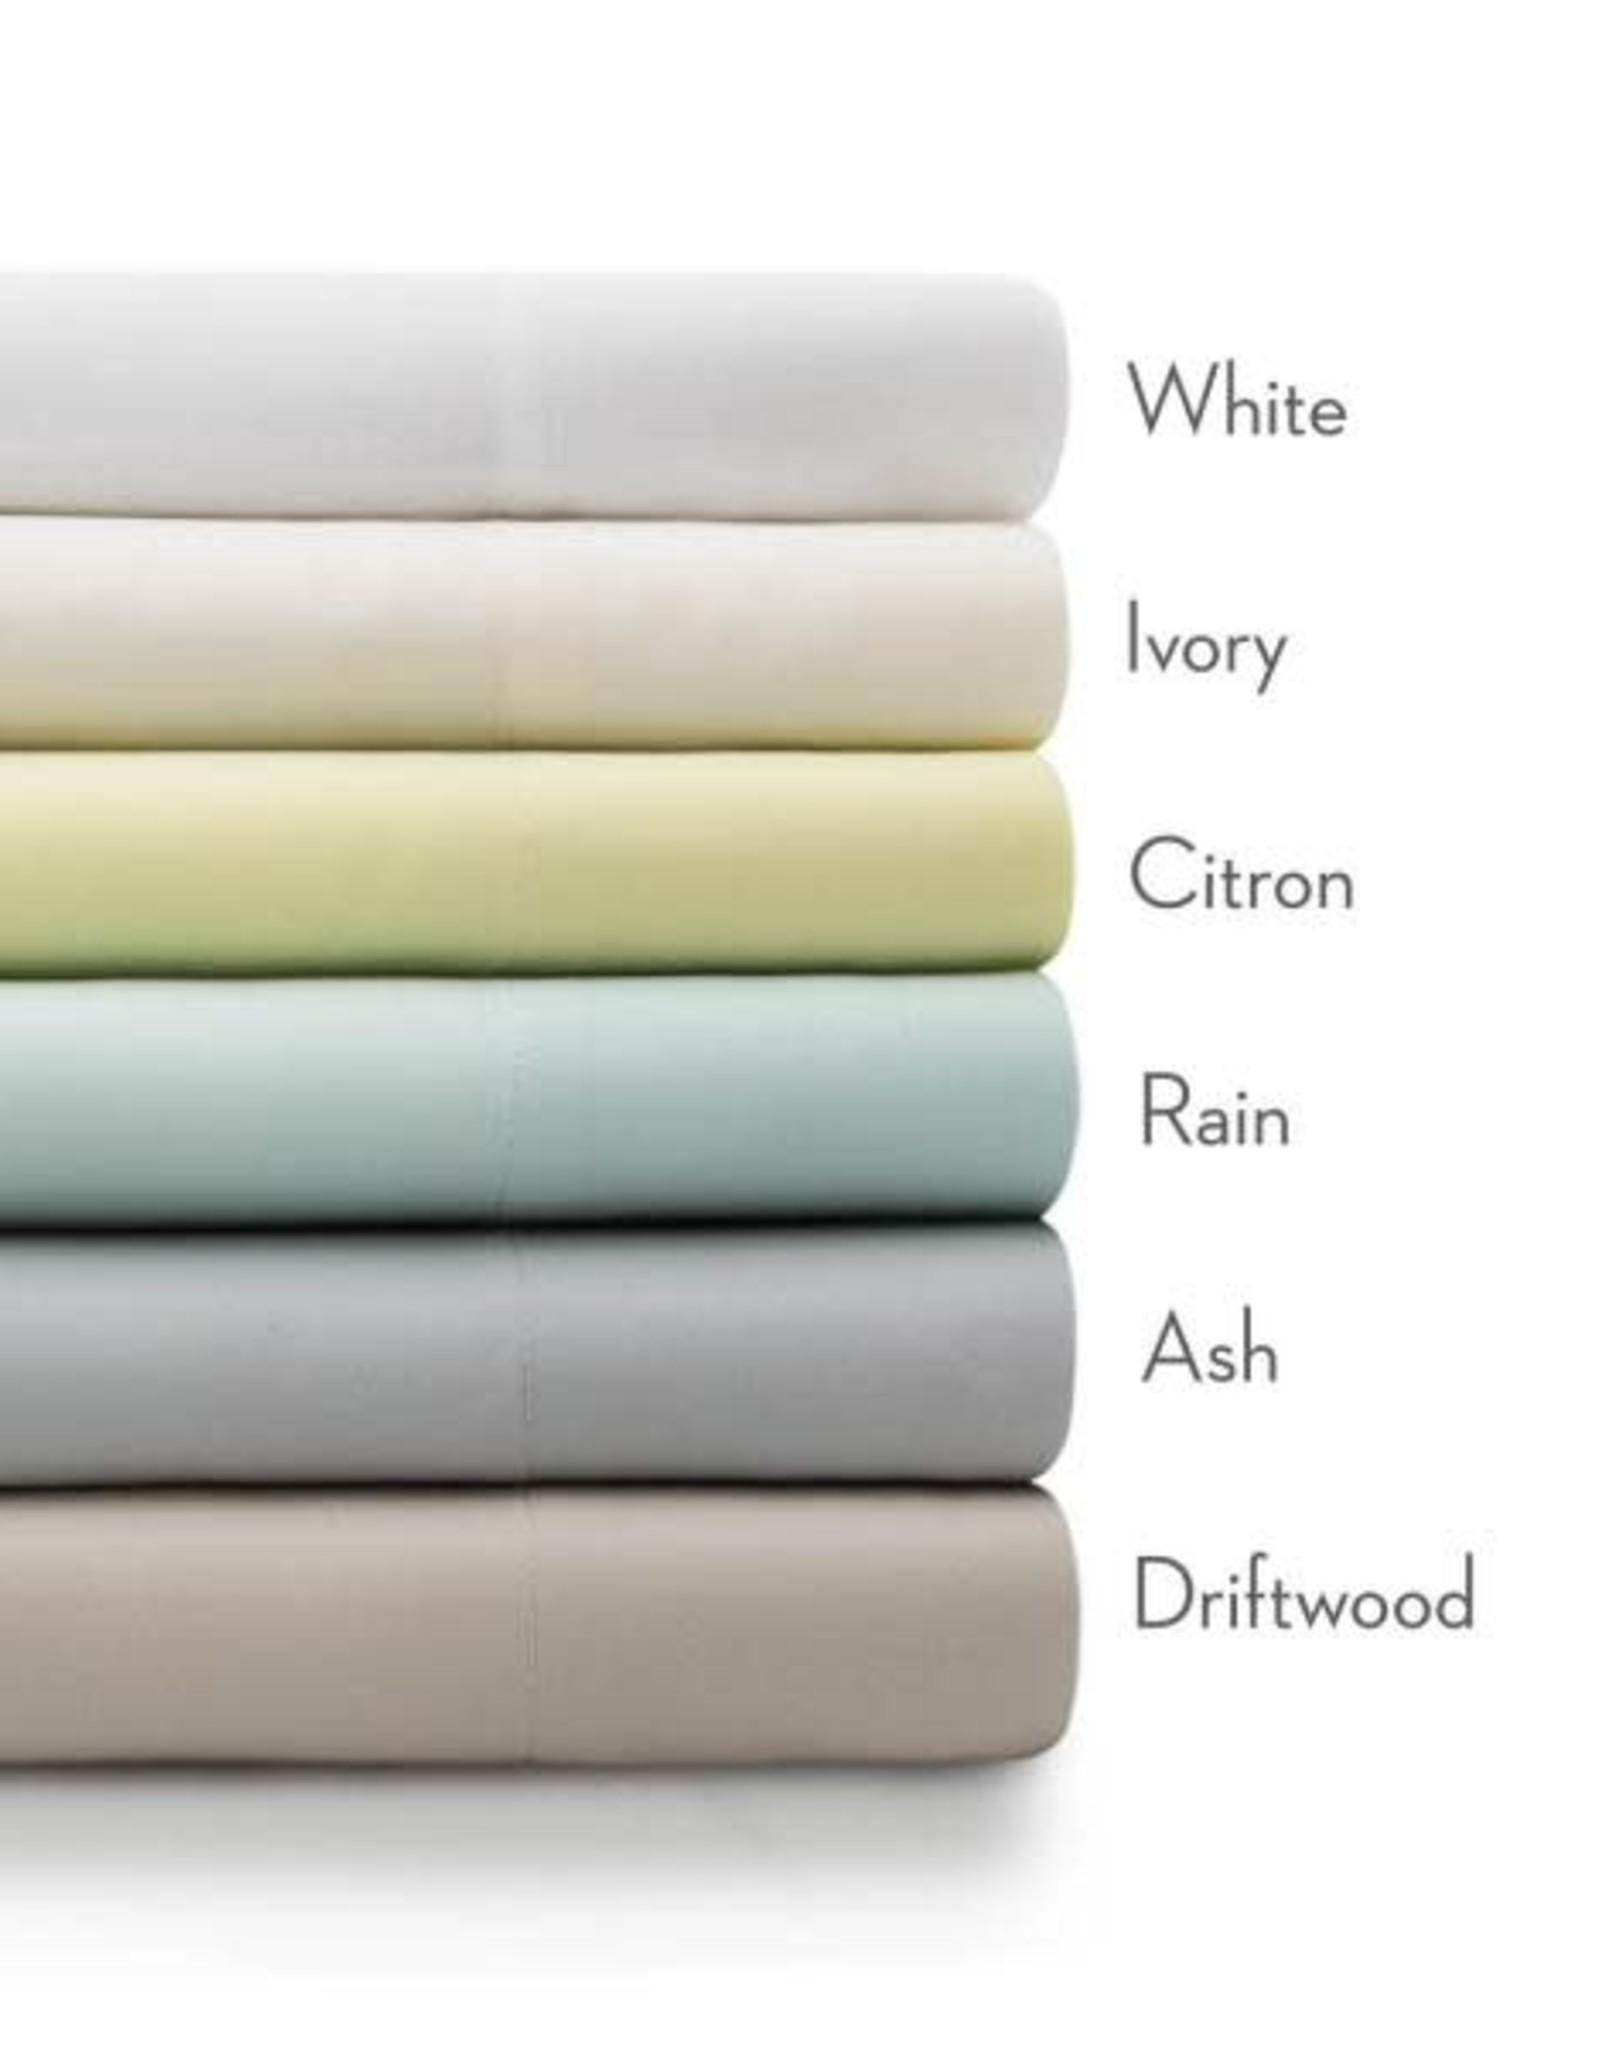 Malouf Bamboo Sheet Set - Queen Size